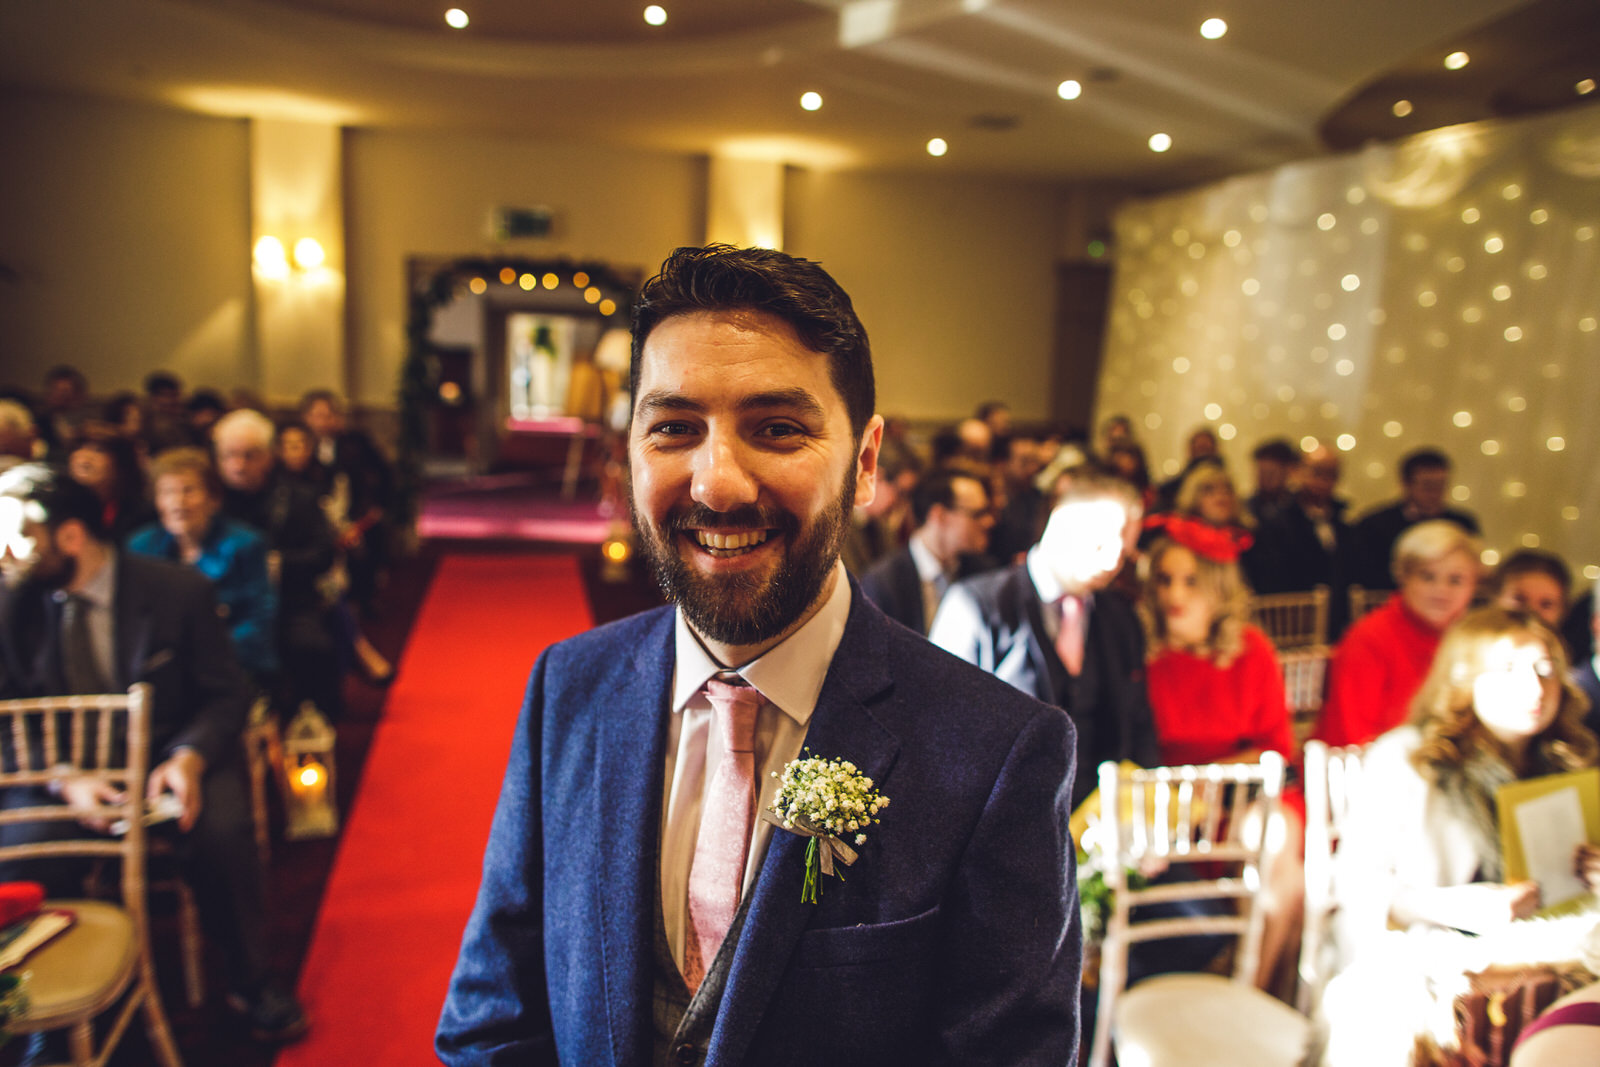 Roger-kenny-wedding-photographer-greystones-wicklow-dublin_030.jpg